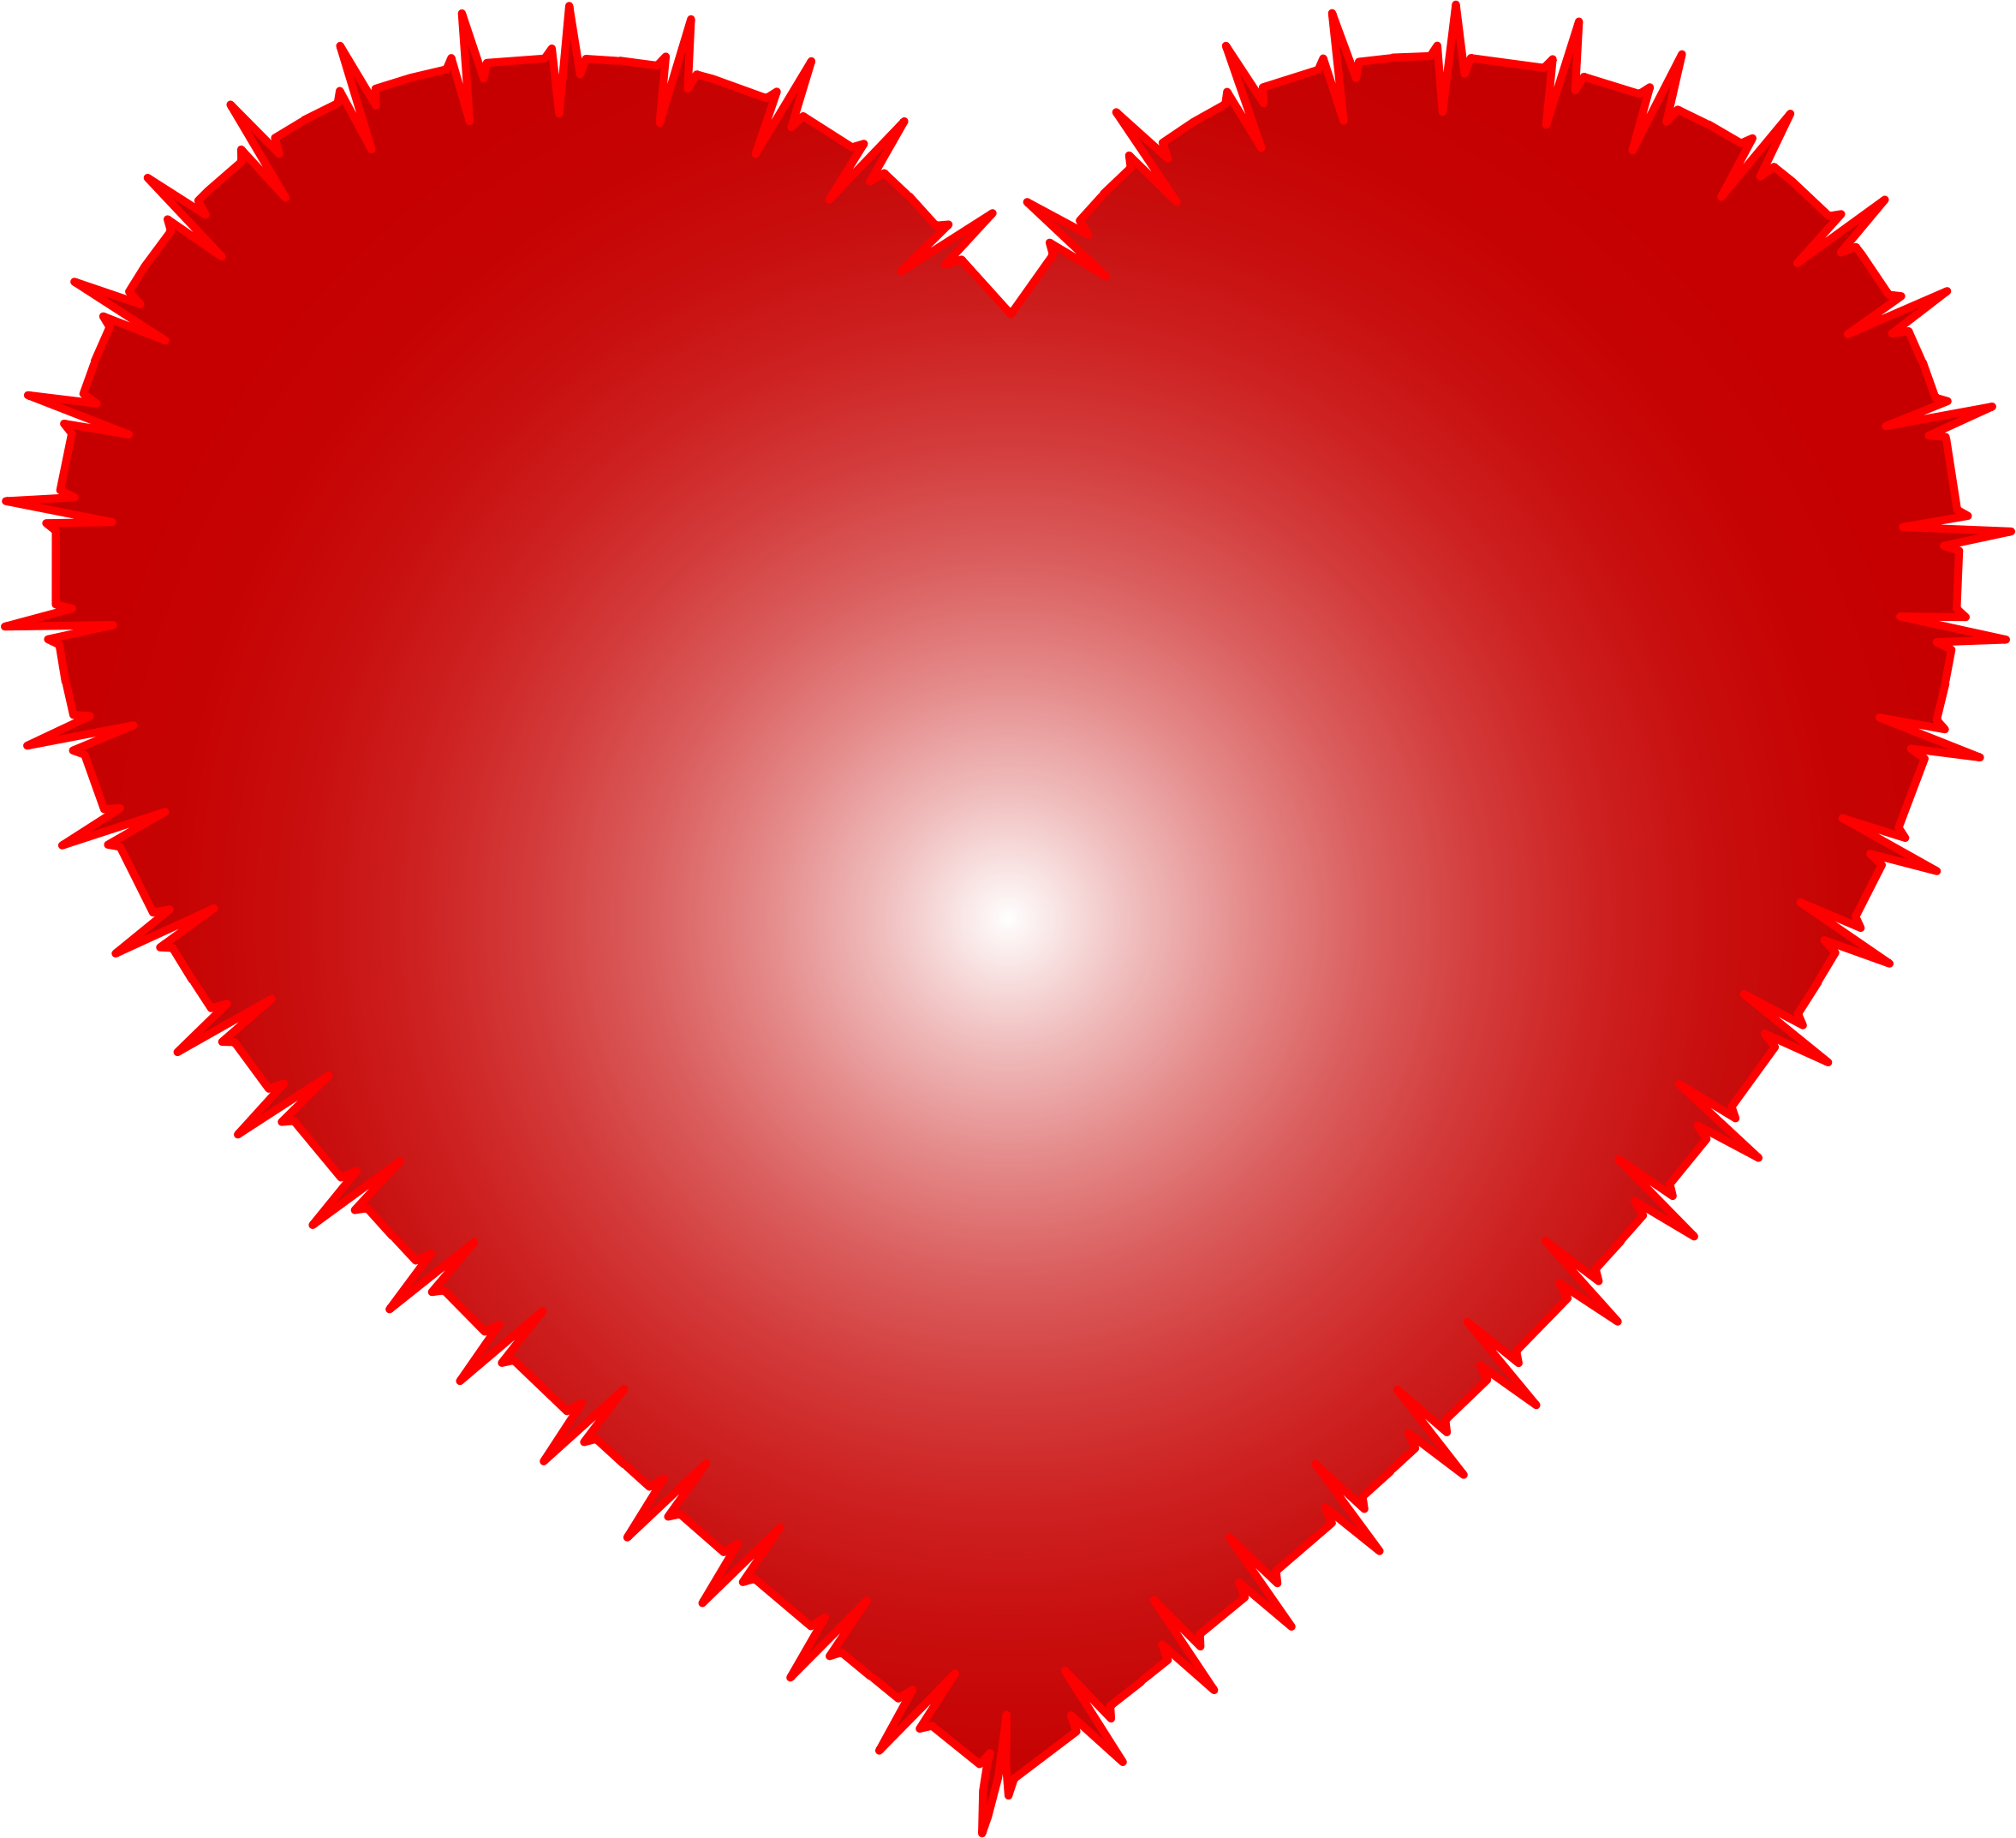 Heart medical clipart free stock Clipart - Heart EKG Rhythm Red free stock